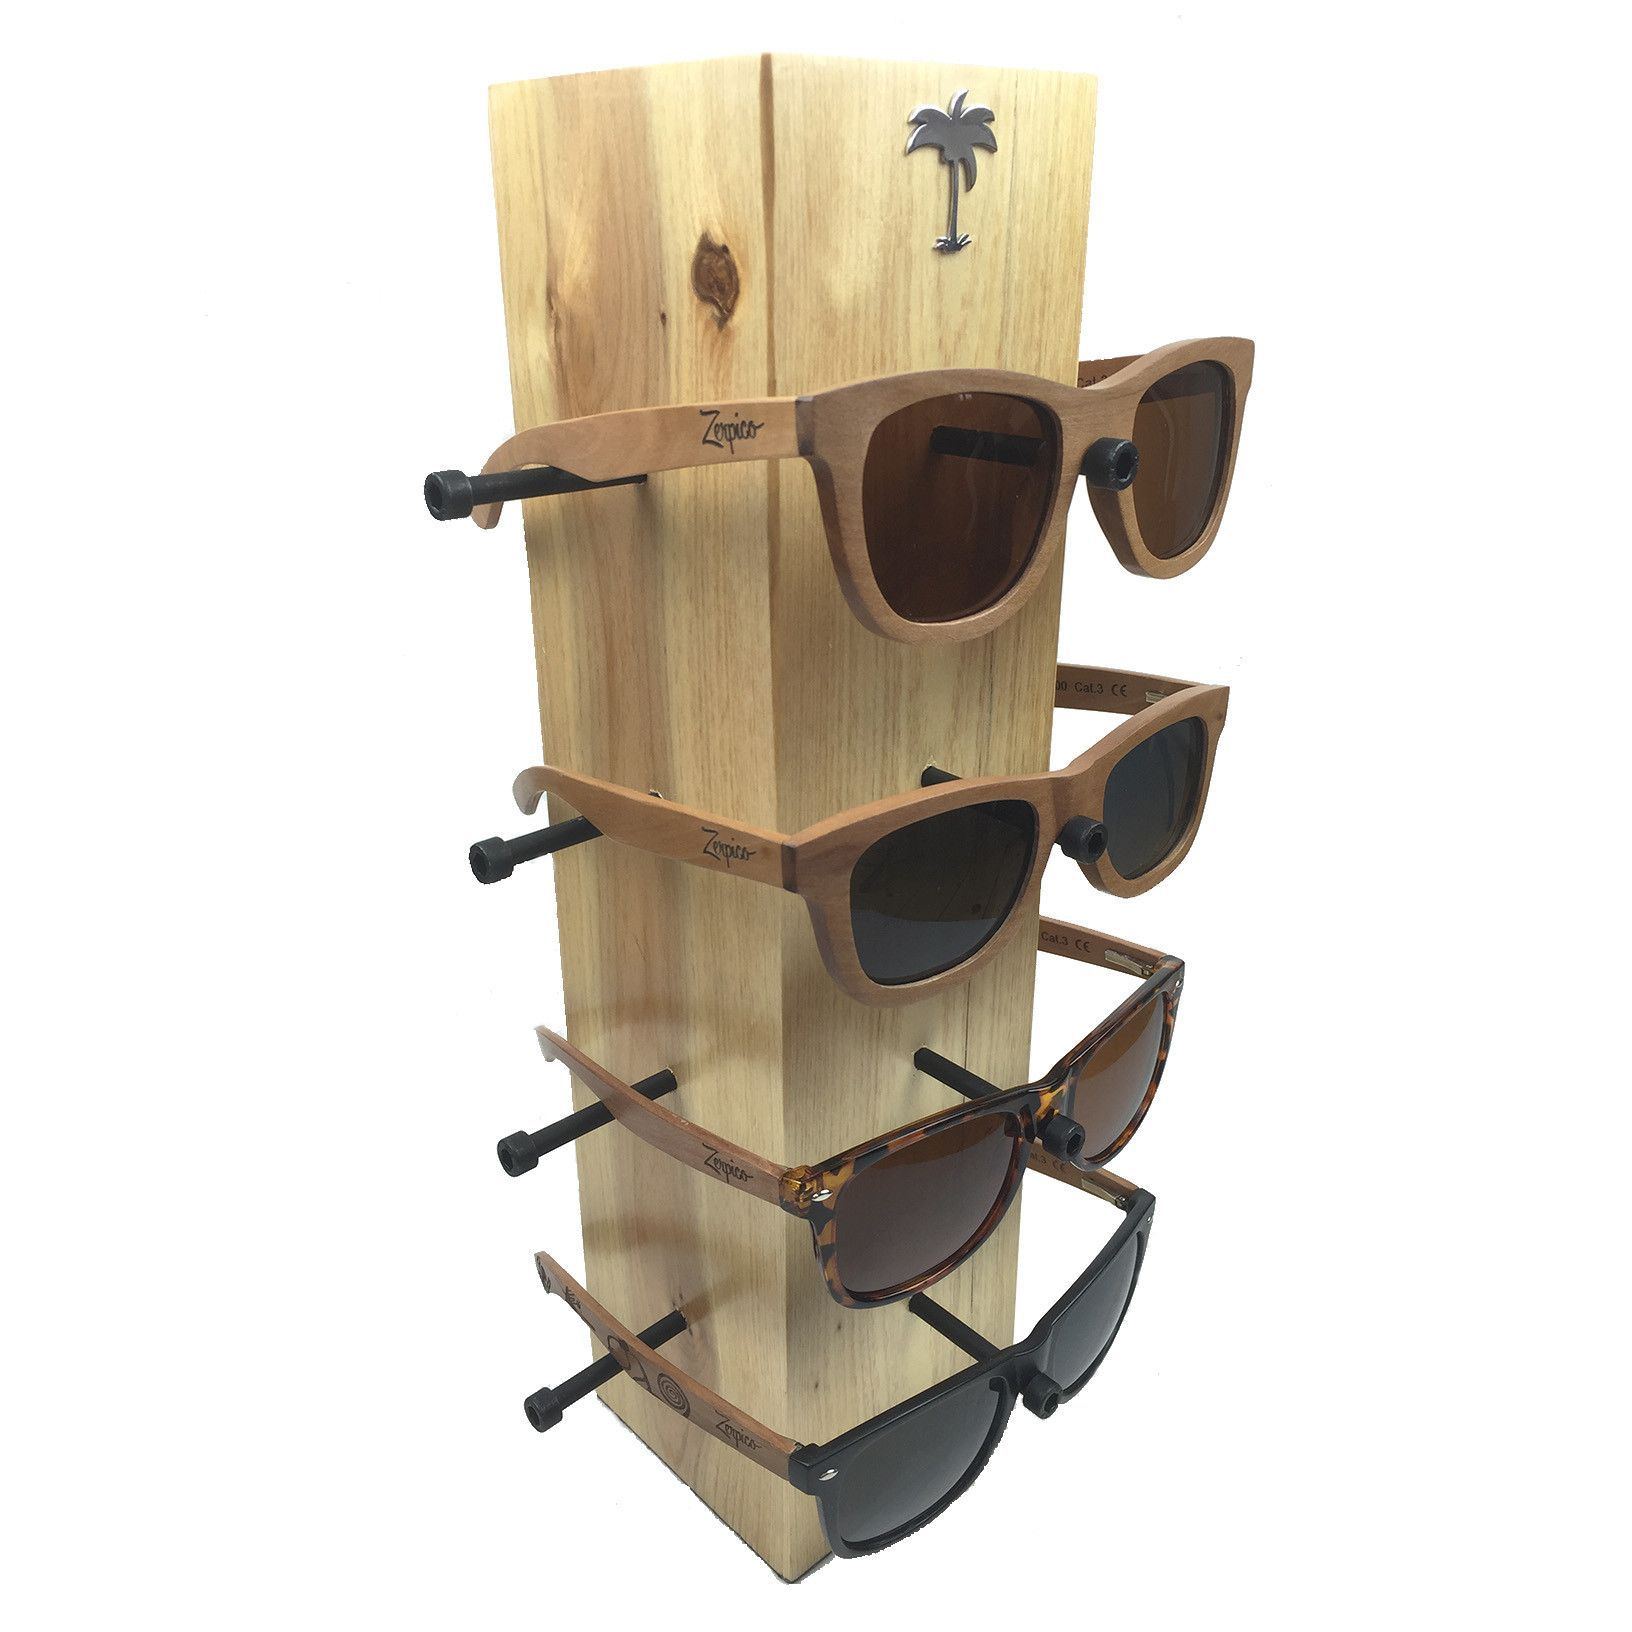 Zerpico Wooden Sunglasses Display Eyewear Pinterest Wooden  # Muebles Sunnies